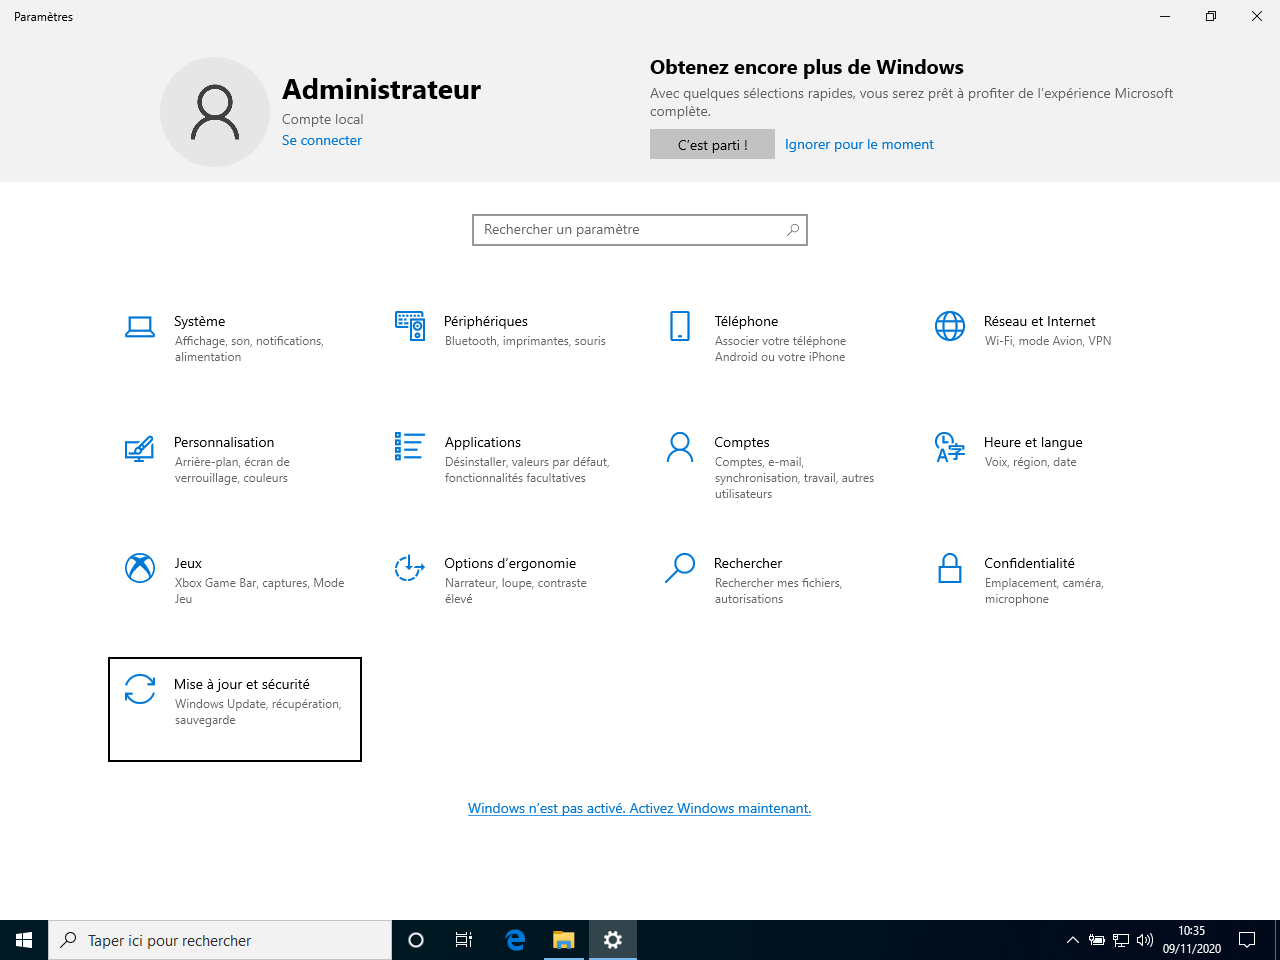 VirtualBox_Windaube_09_11_2020_10_35_02.png